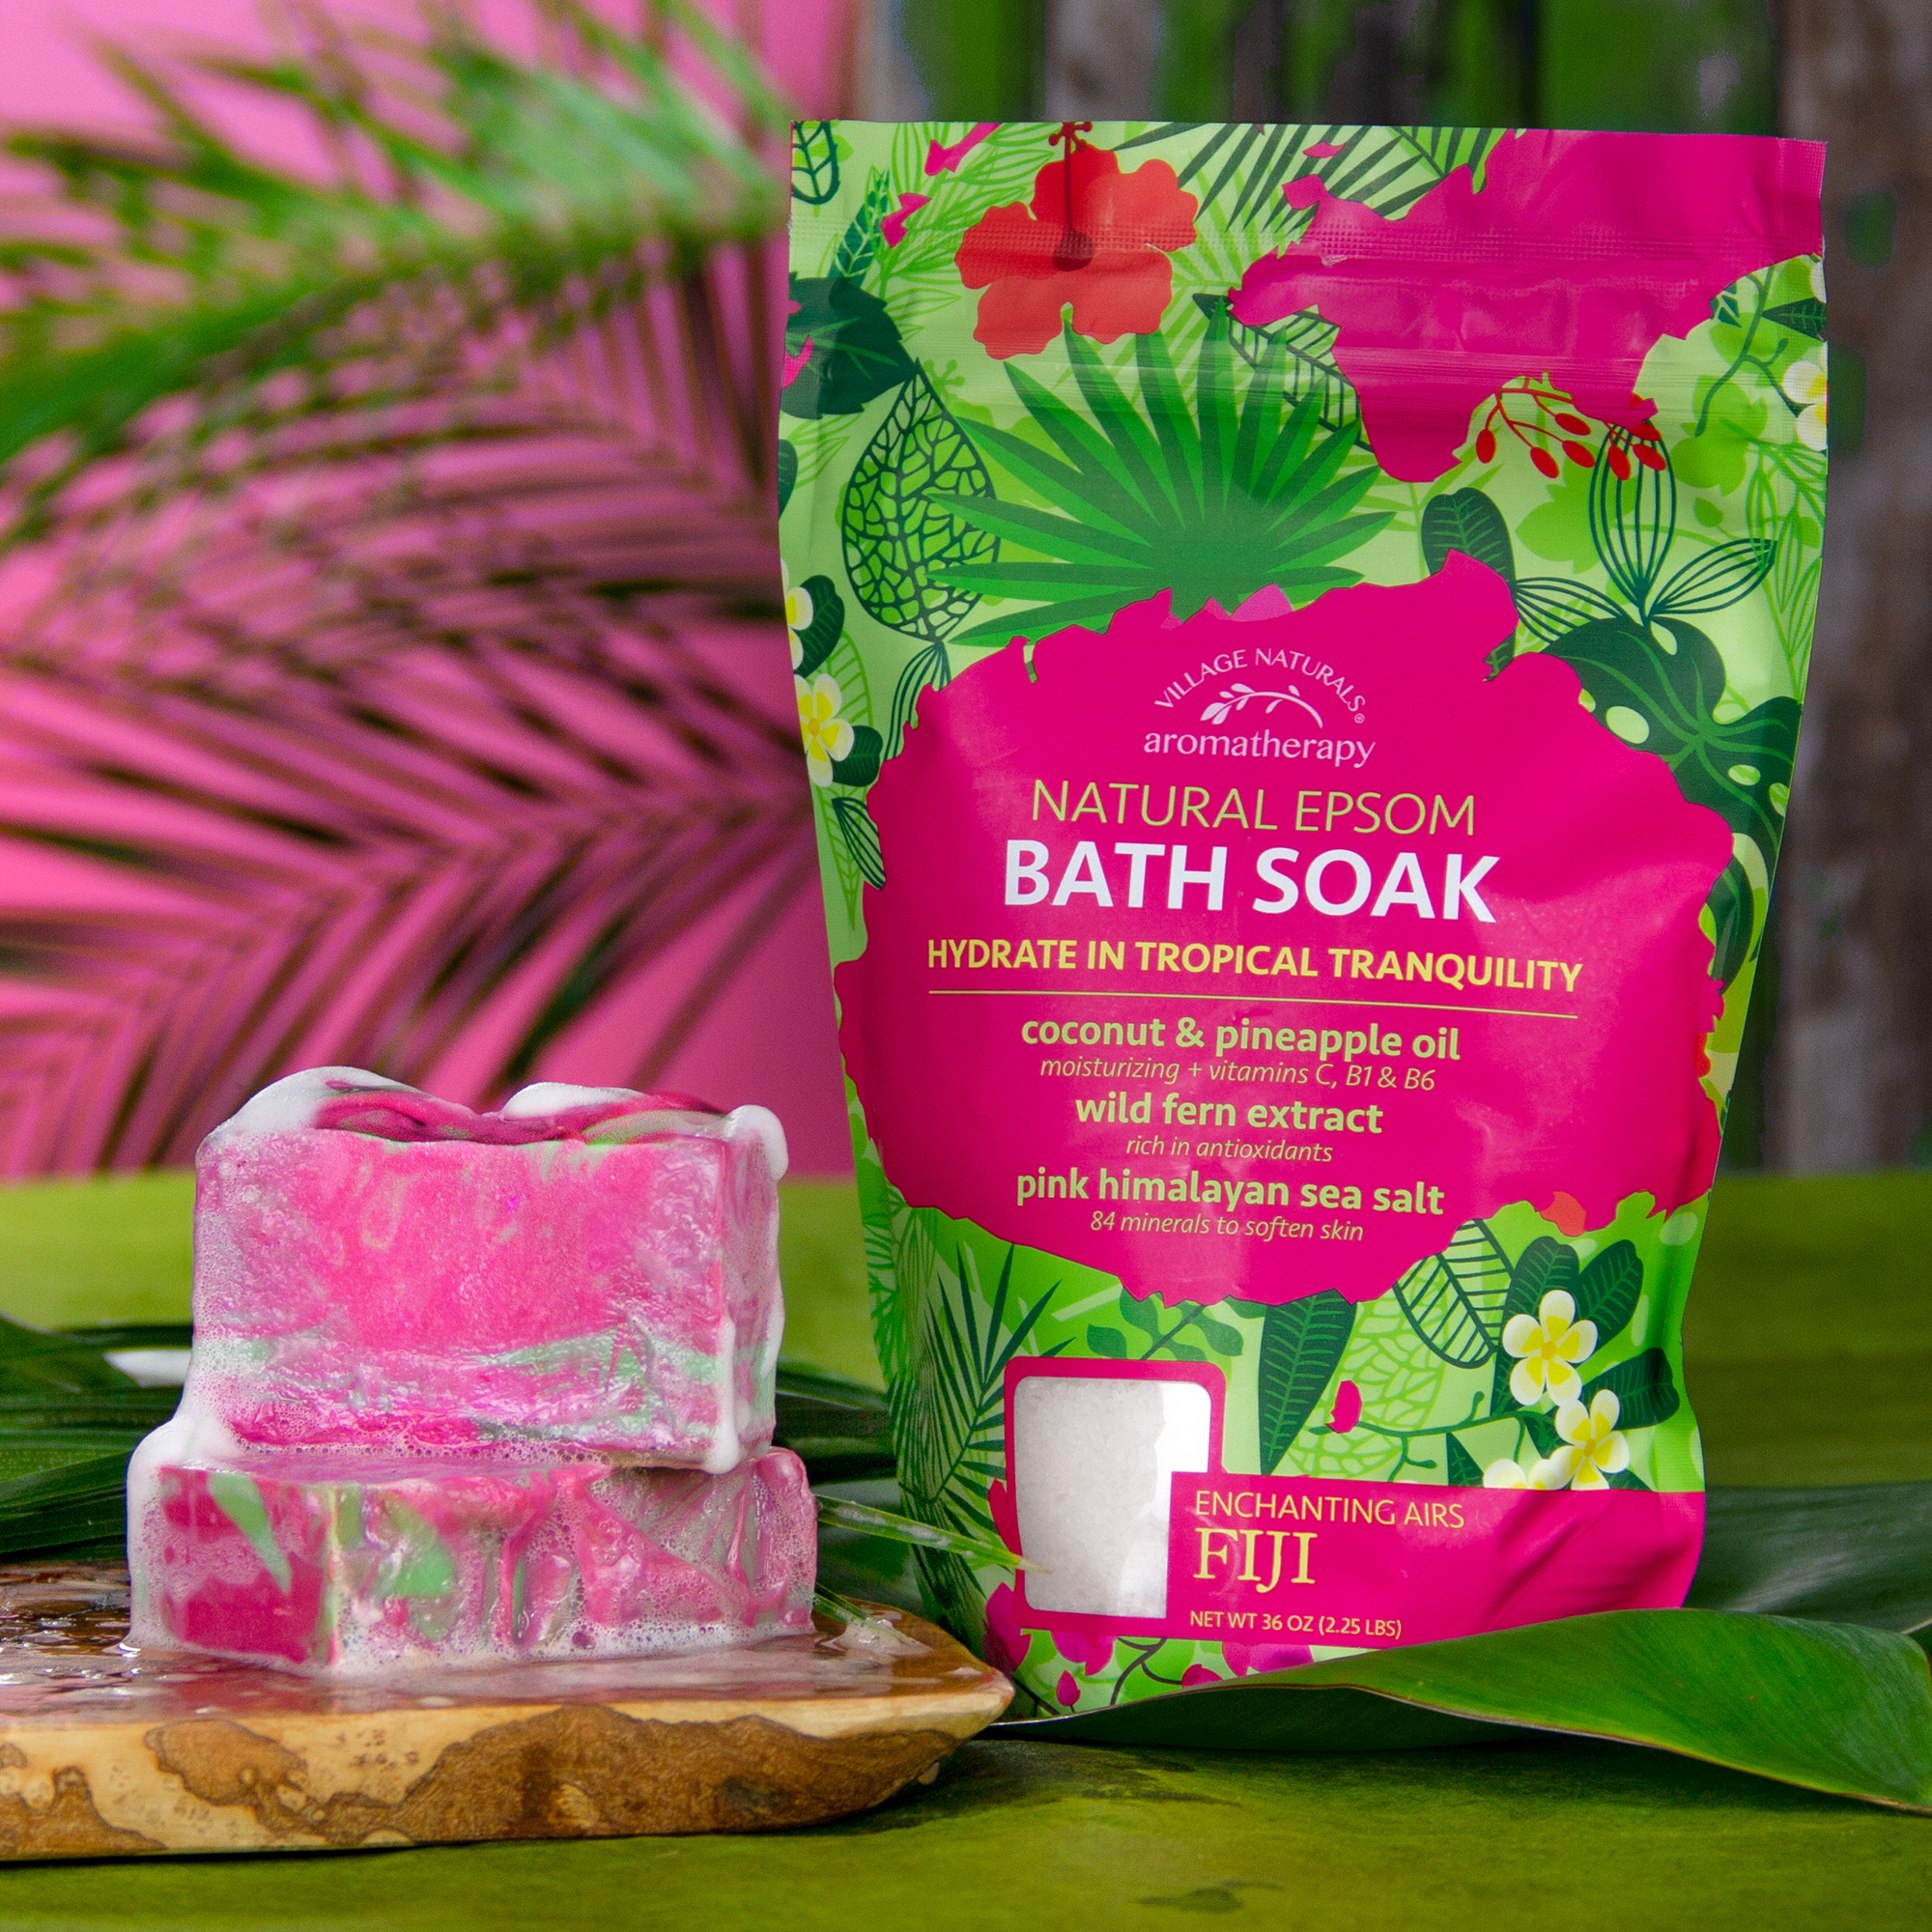 Village Naturals Aromatherapy Fiji Bath Soak #VillageNaturals #Aromatherapy